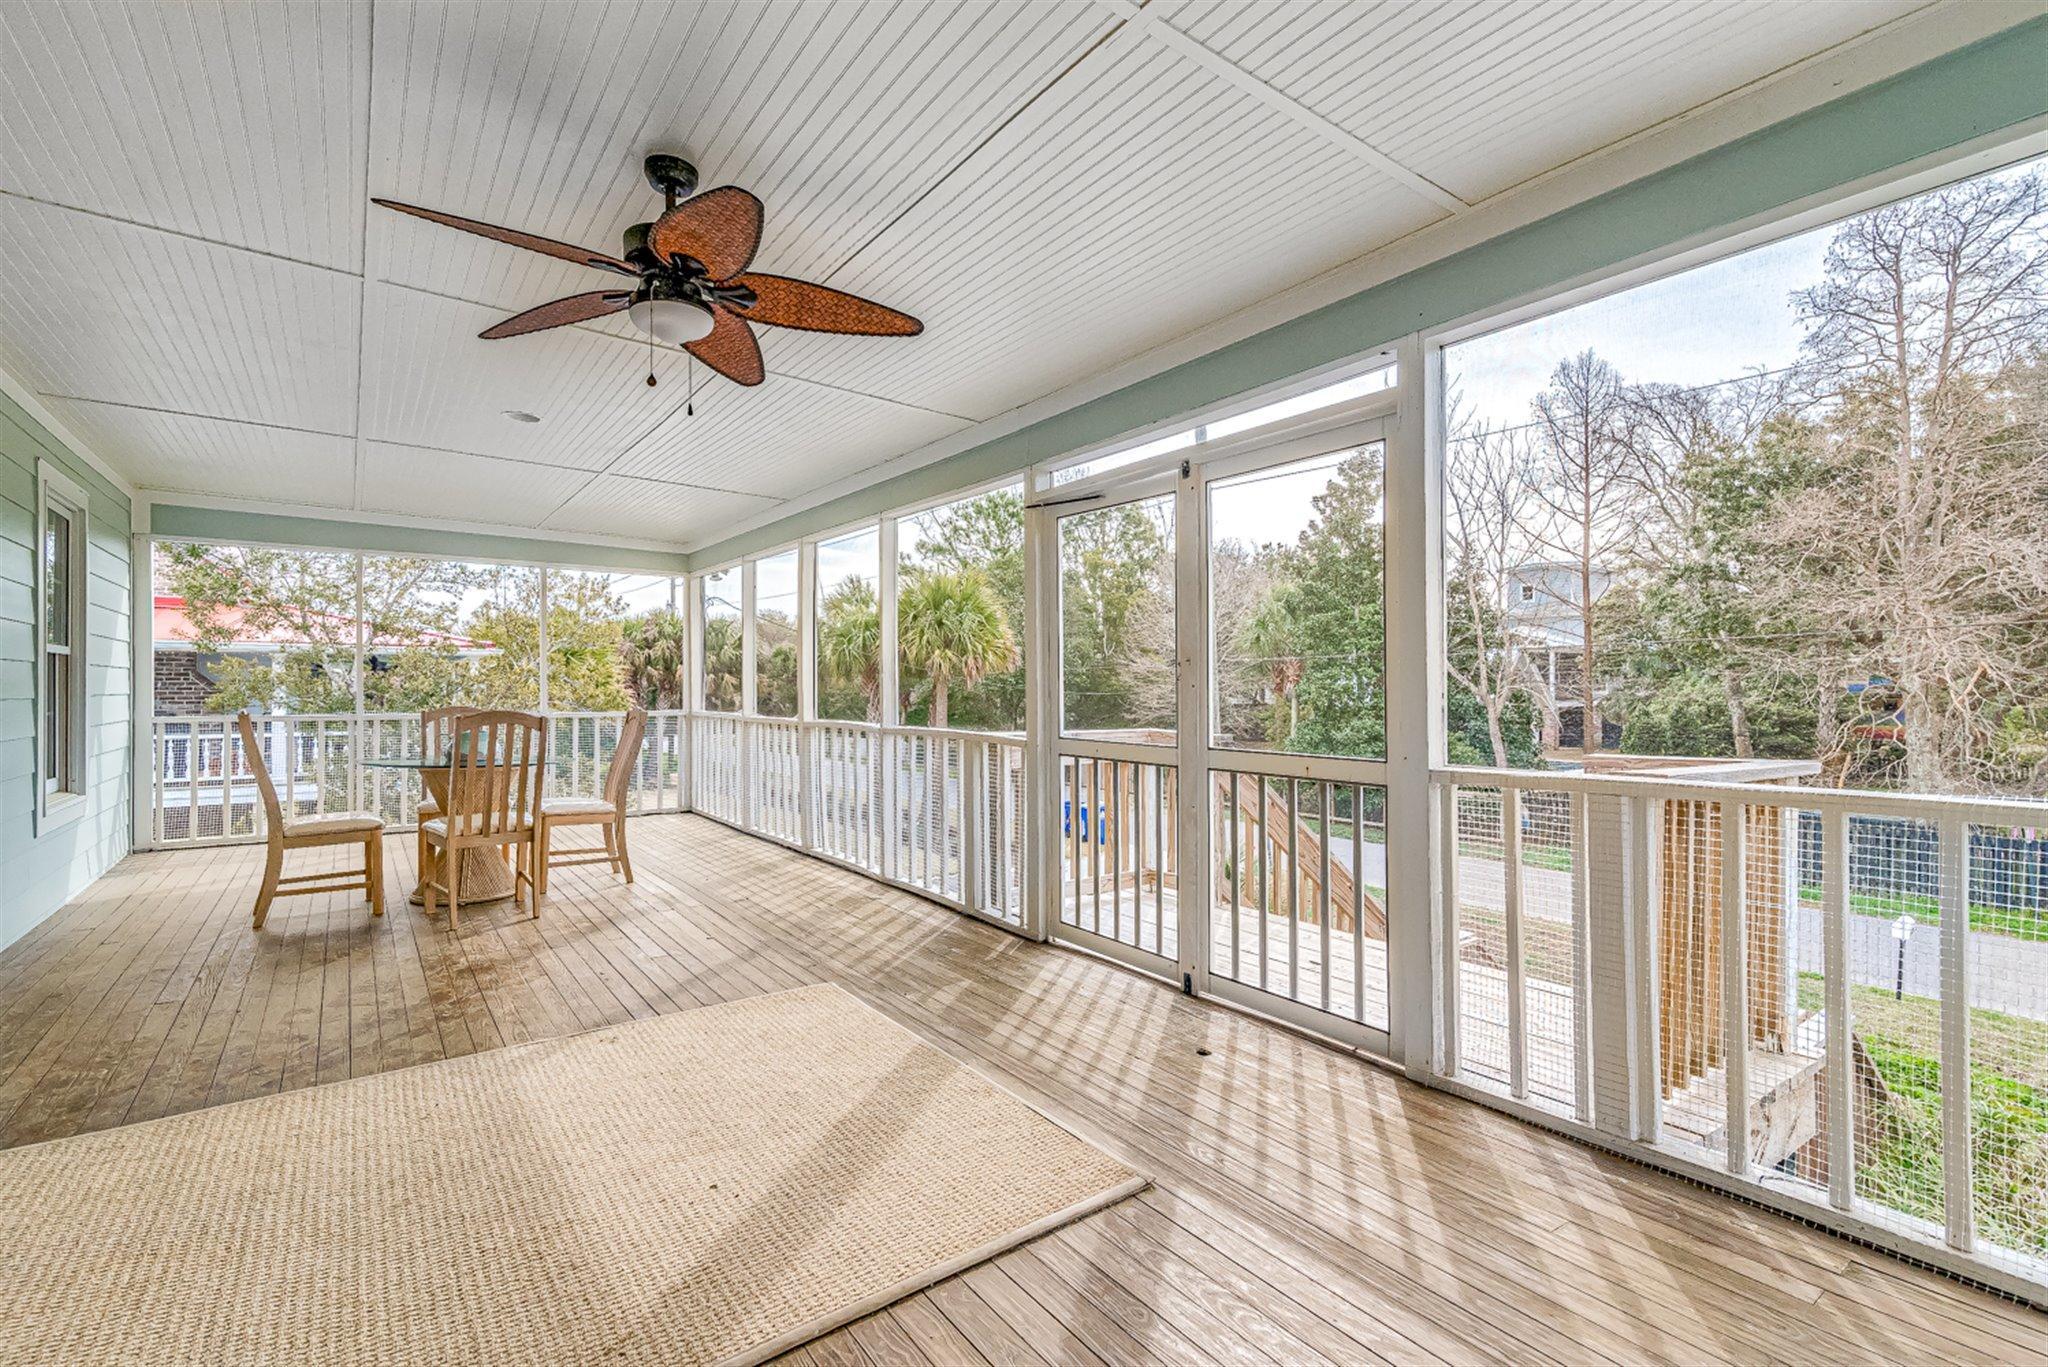 Sullivans Island Homes For Sale - 2107 Middle, Sullivans Island, SC - 18